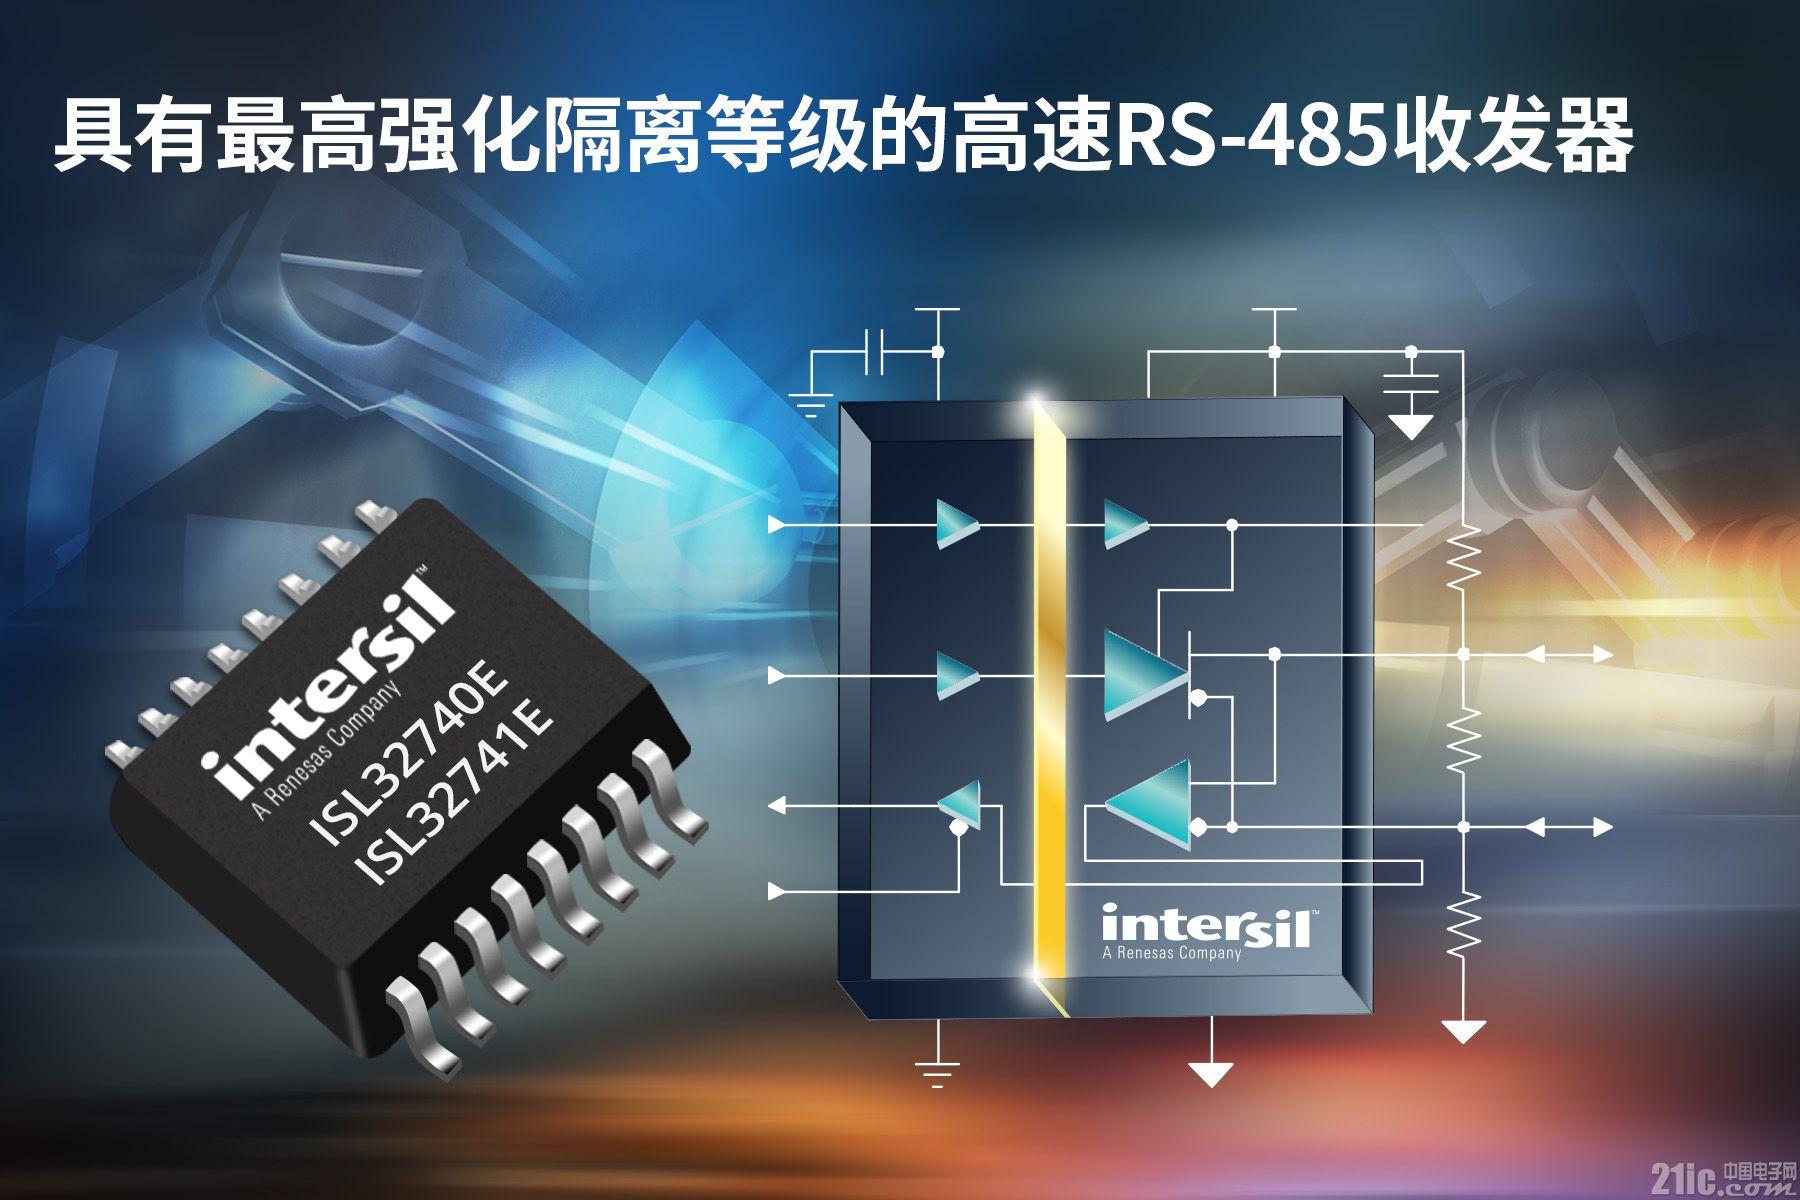 Intersil推出具有最高强化隔离等级的 高速RS-485收发器